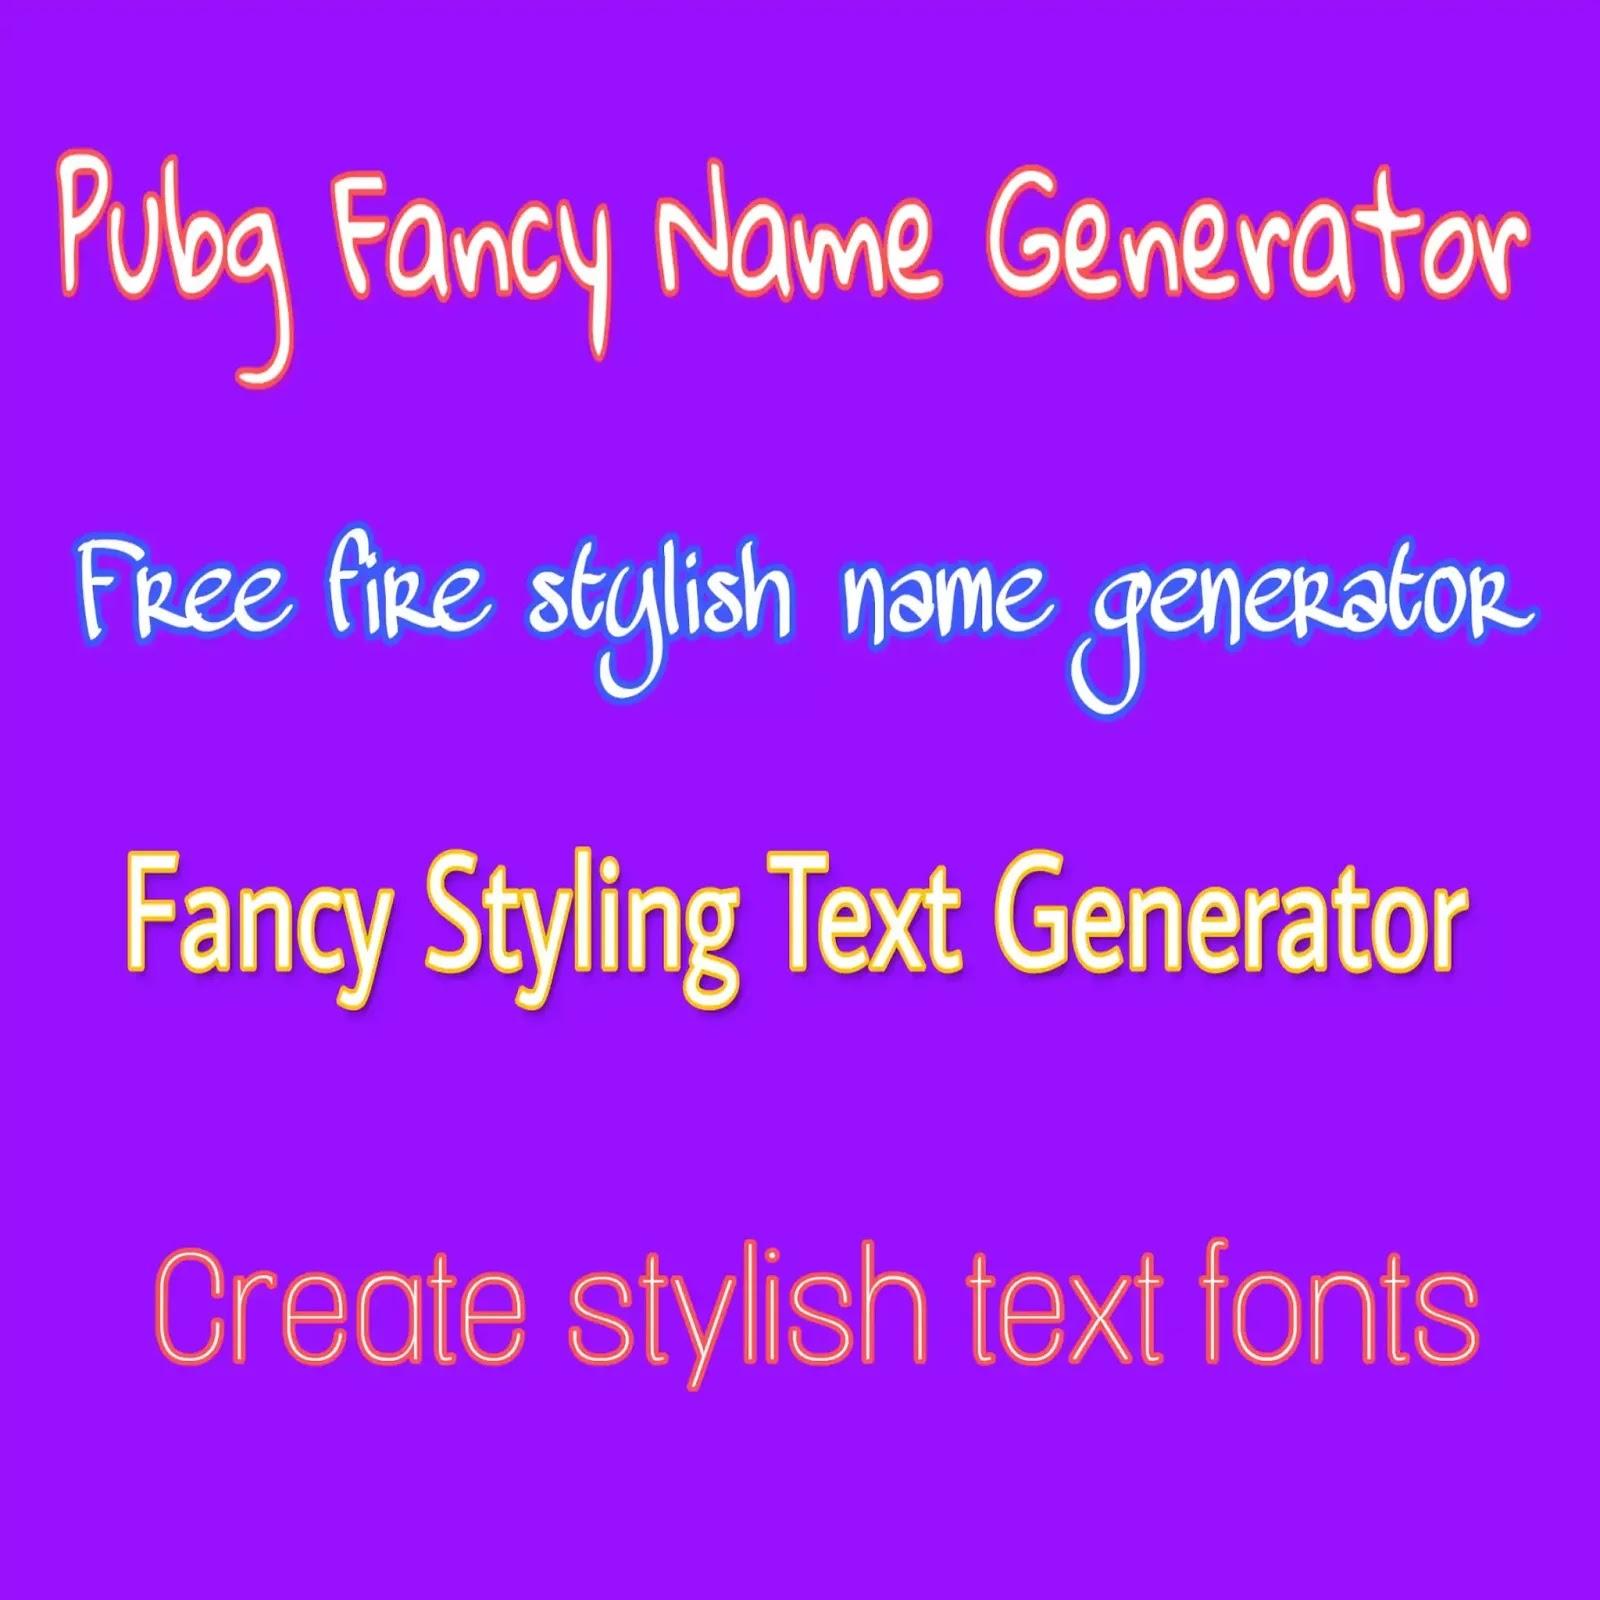 Fancy text maker online, pubg name generator with symbols, fancy text generator, free fire name maker, hit fonts, stylish font maker